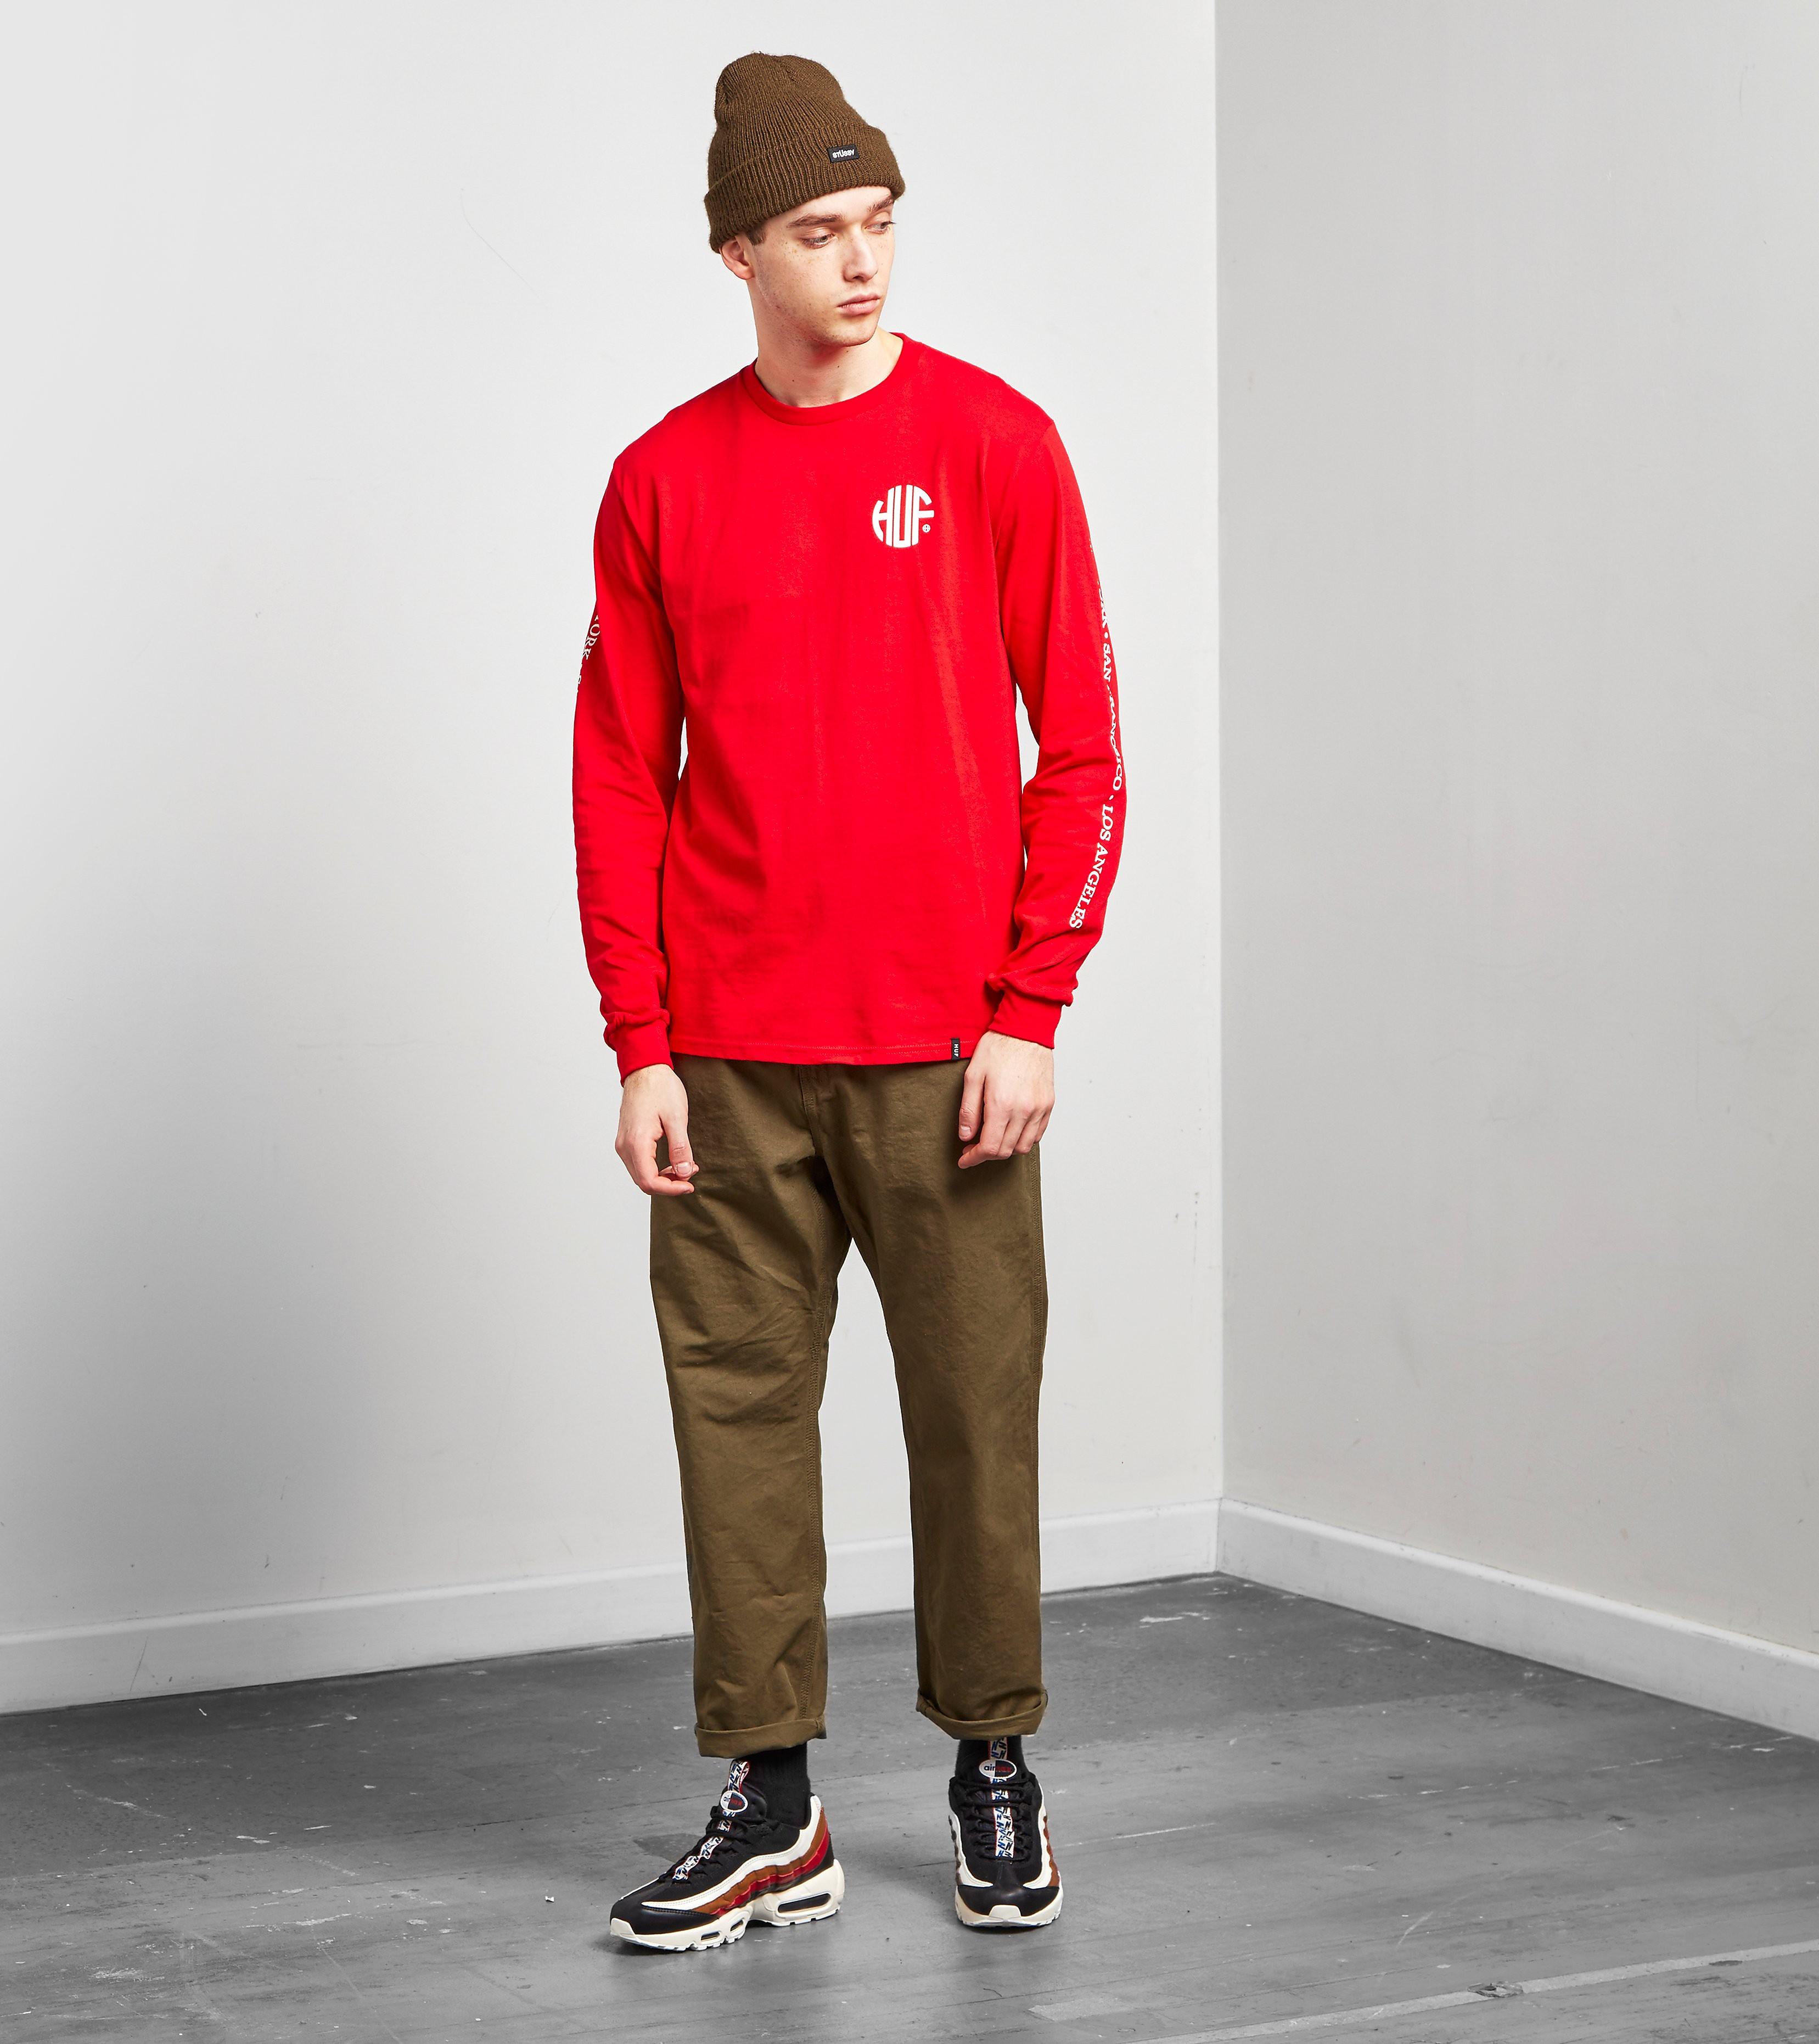 HUF T-Shirt Manches Longues Regional